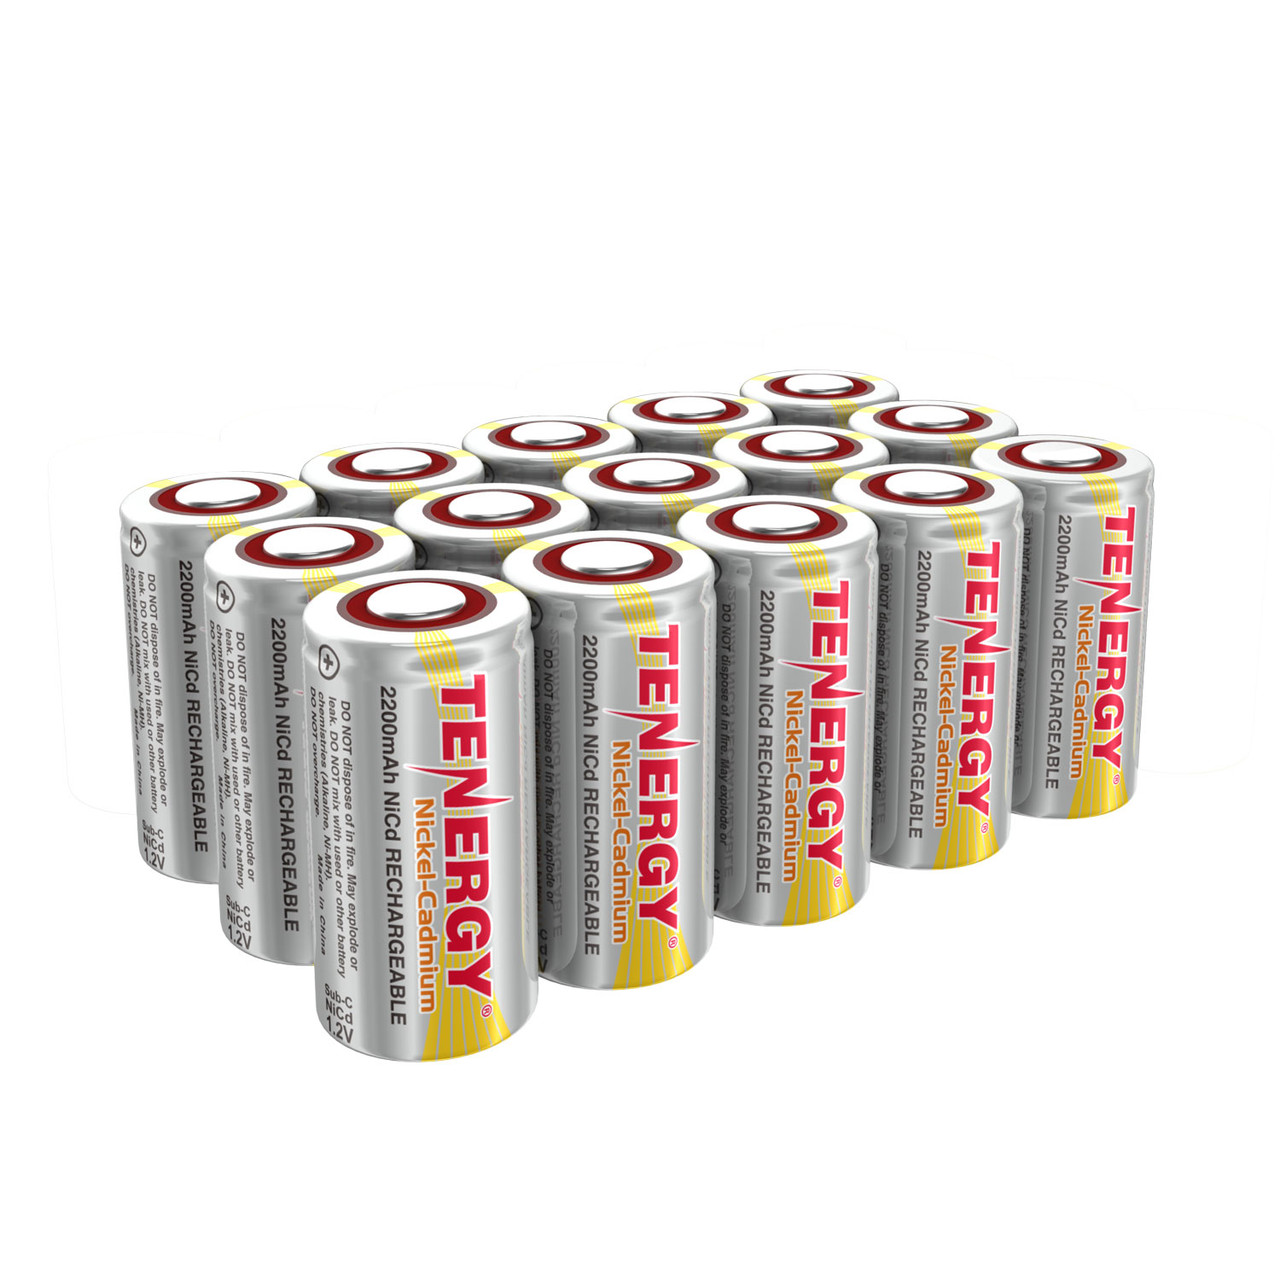 COMBO: 15 pcs of NiCd Sub C 2200mAh Batteries for Power Tools Flat Top No Tabs